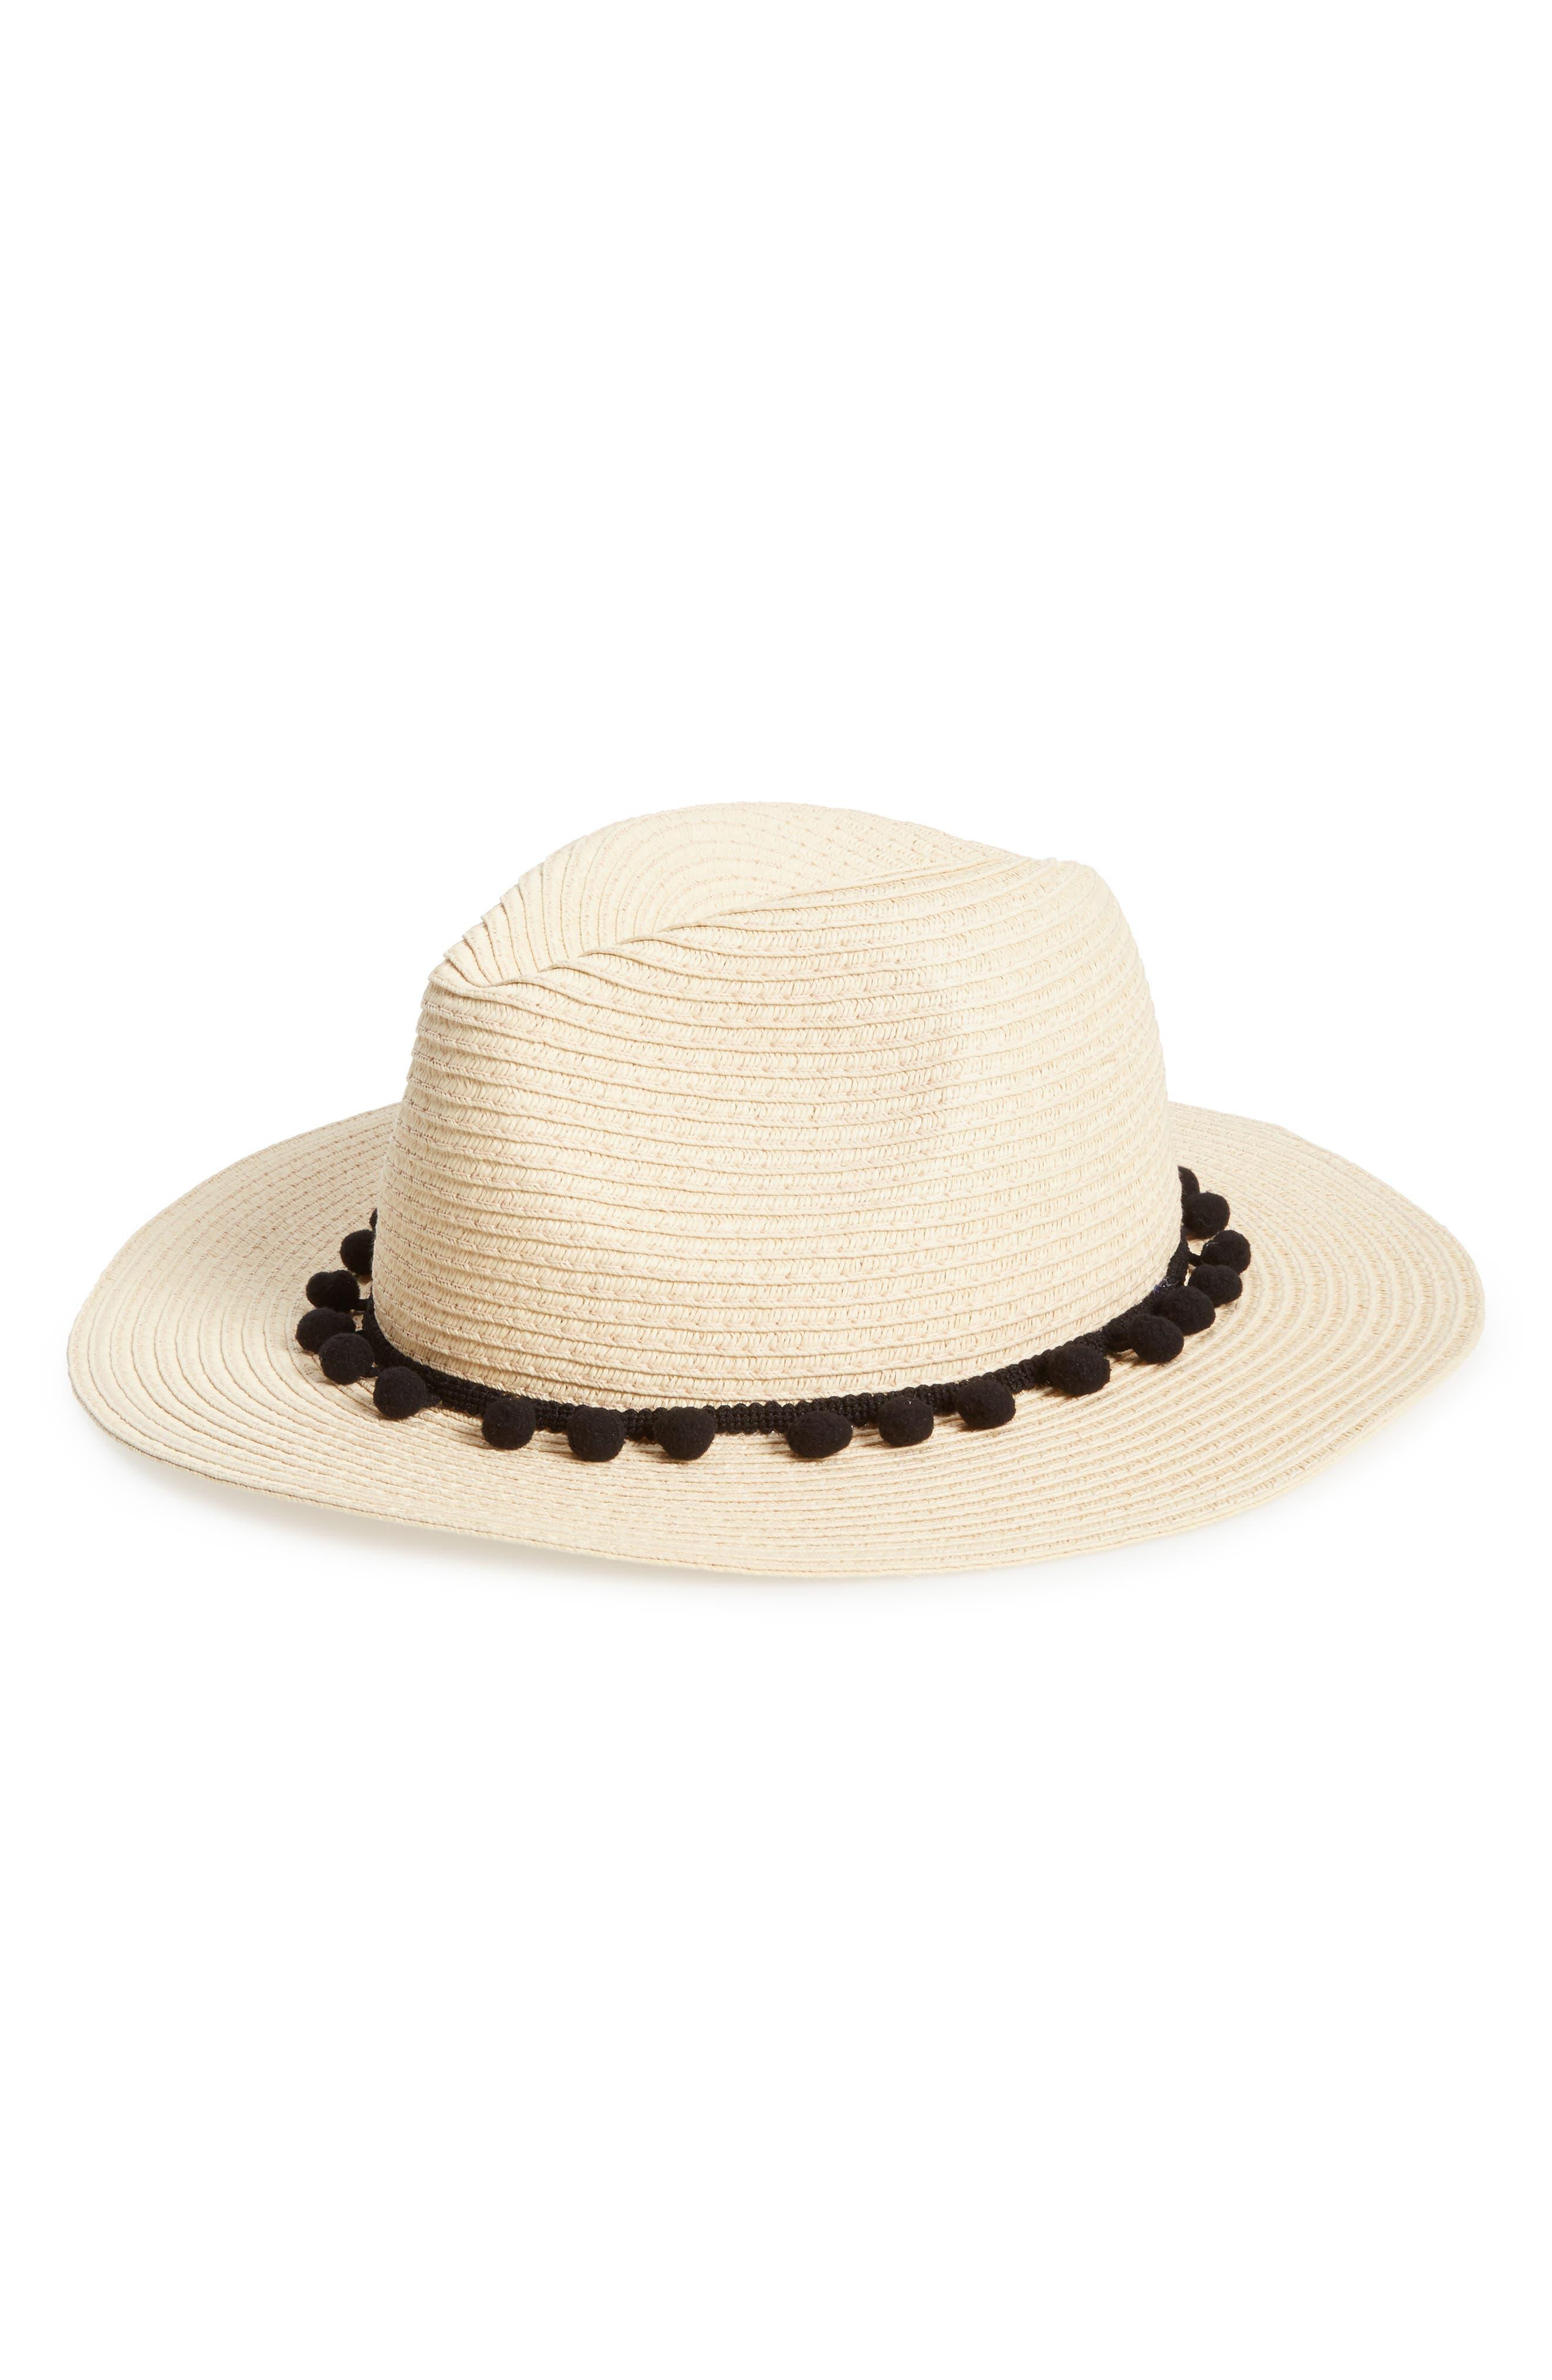 Pom Pom Panama Hat,                             Main thumbnail 1, color,                             101